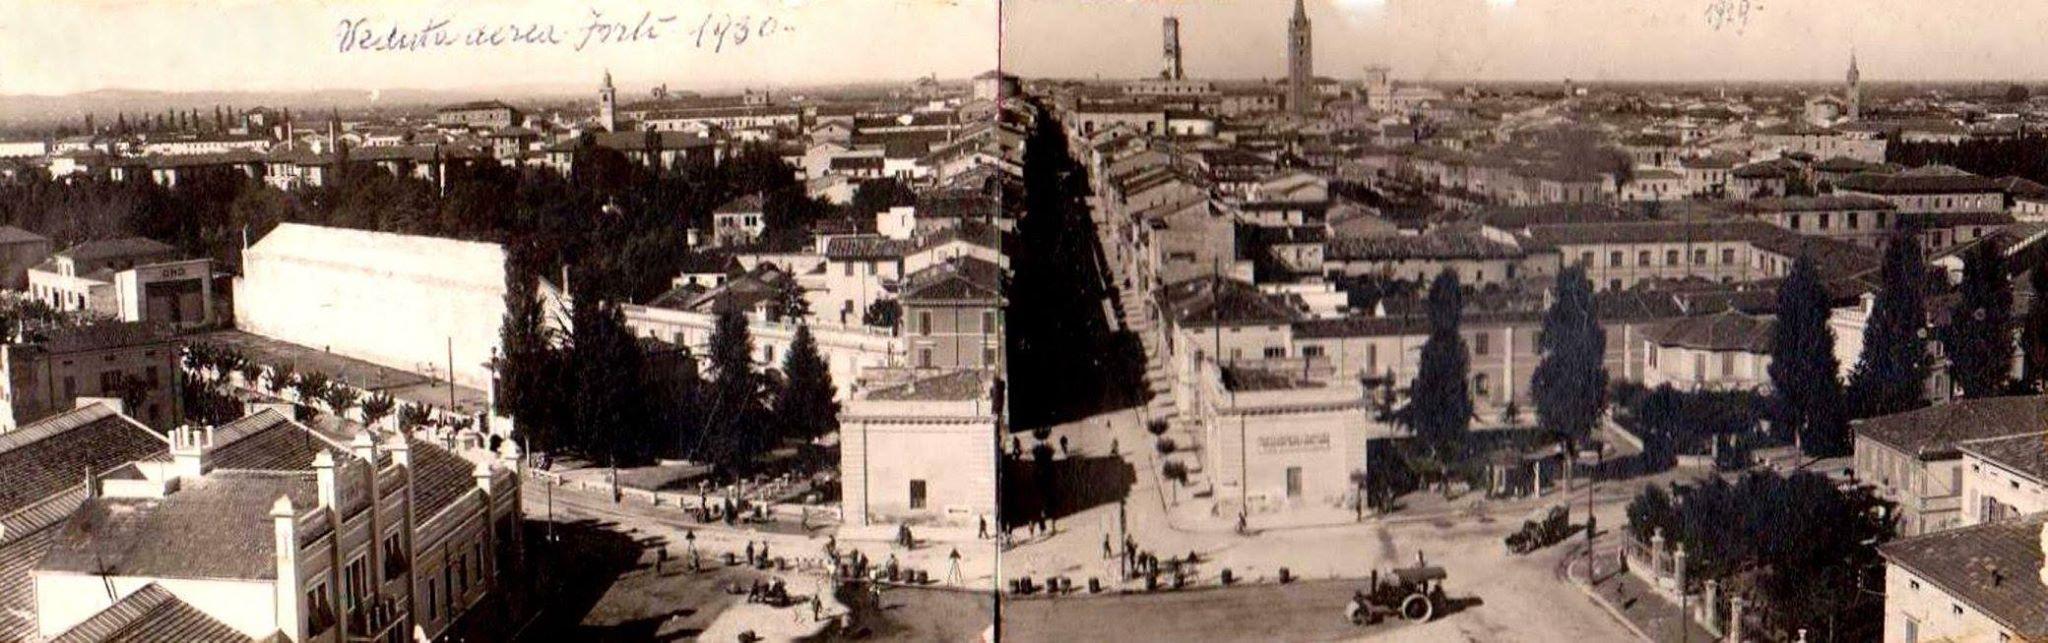 foto-Sardi 1930 piazzetta sferisterio